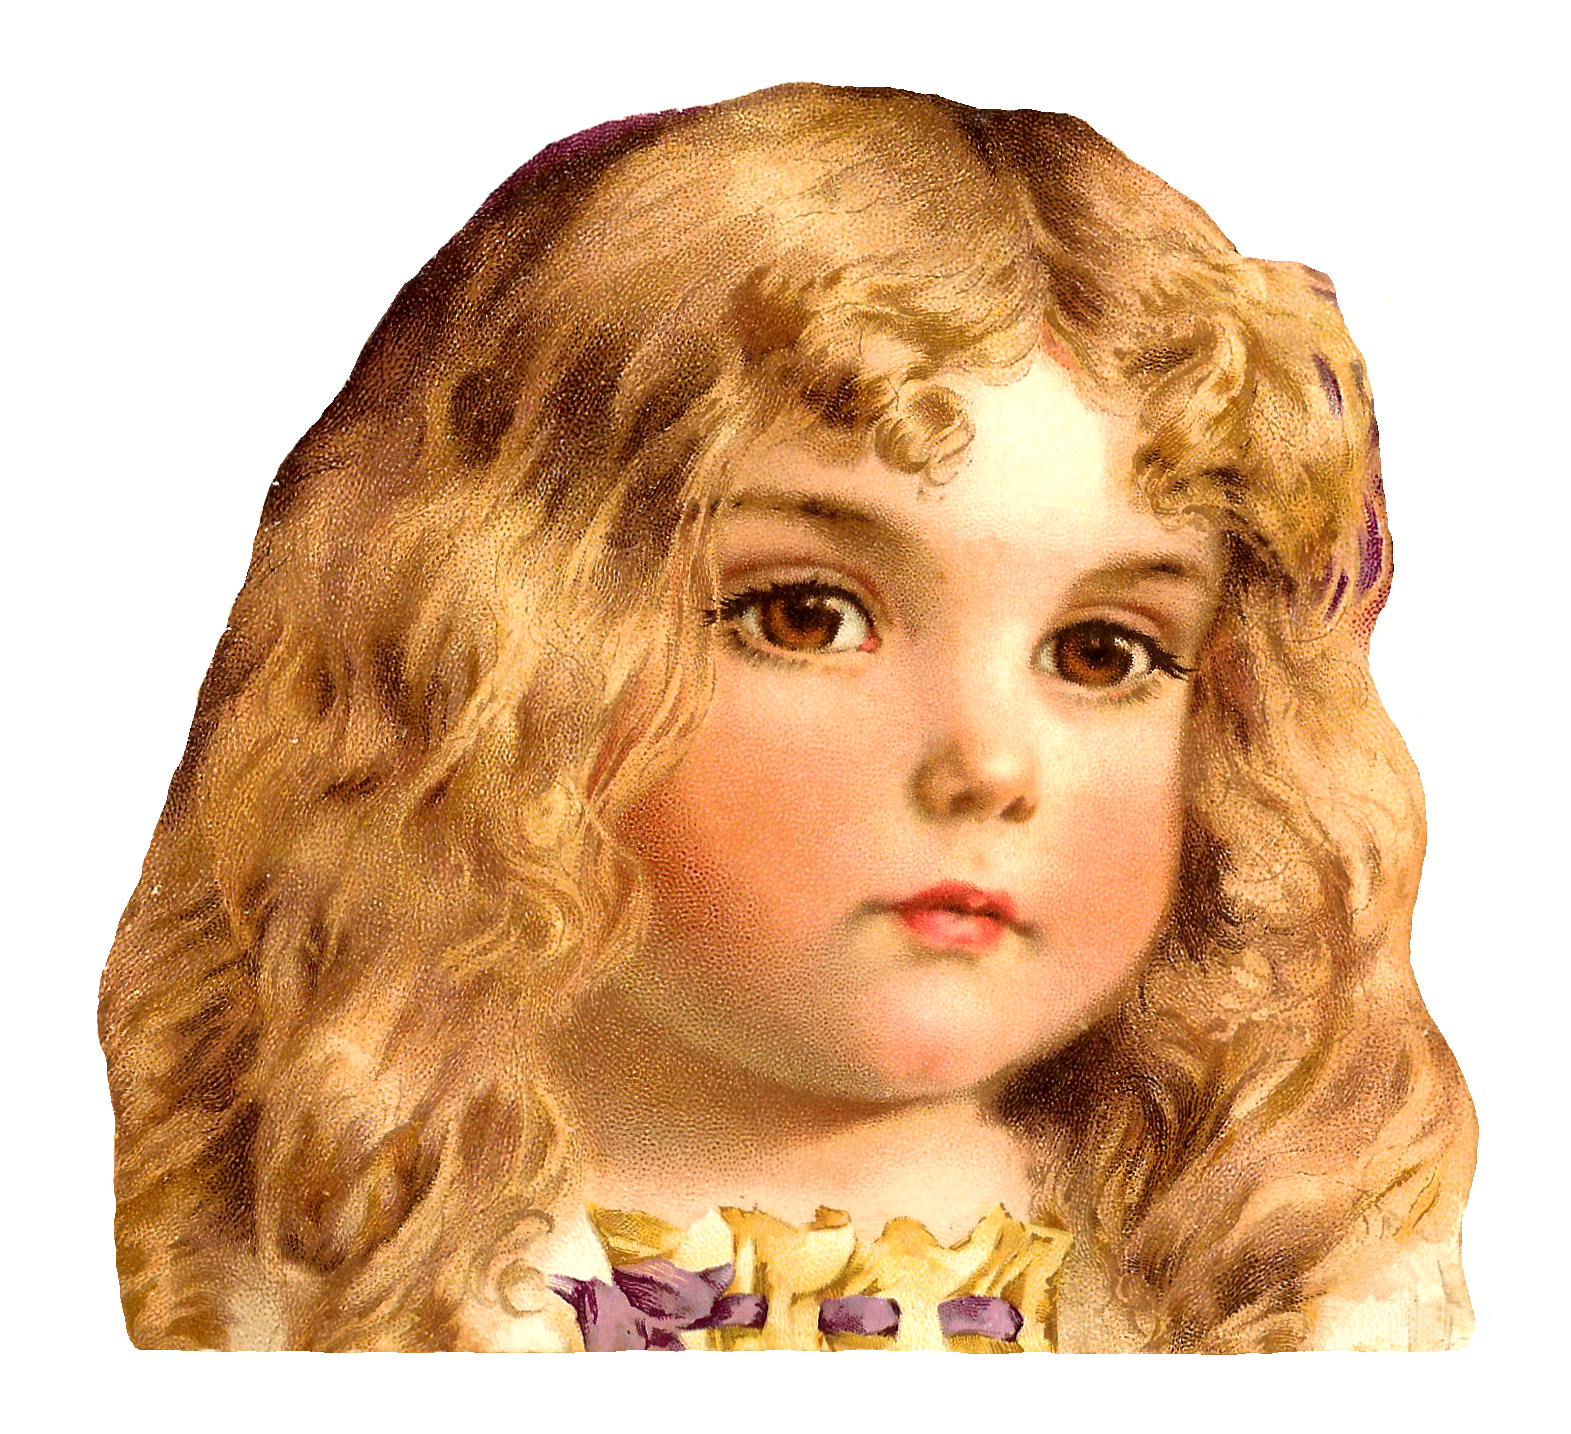 Baby girl hair clipart free stock Cute brown hair baby girl clipart - ClipartFox free stock